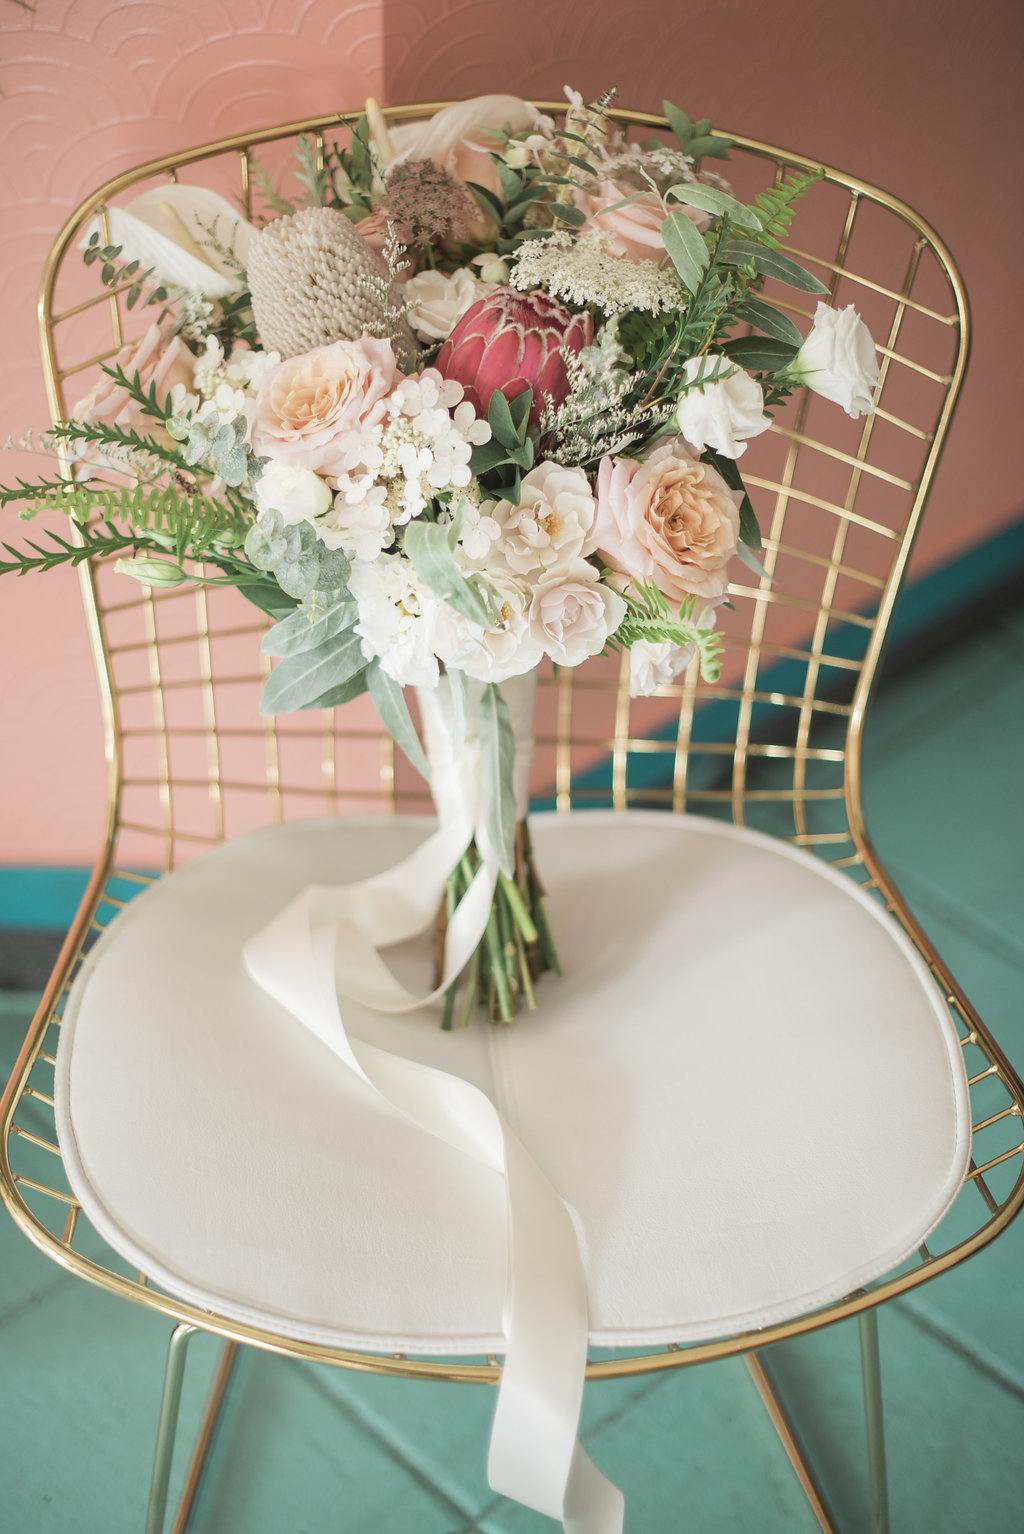 Motel-Restaurant-Editorial-Vineyard-Bride-photo-by-Blynda-DaCosta-Photography-011.JPG